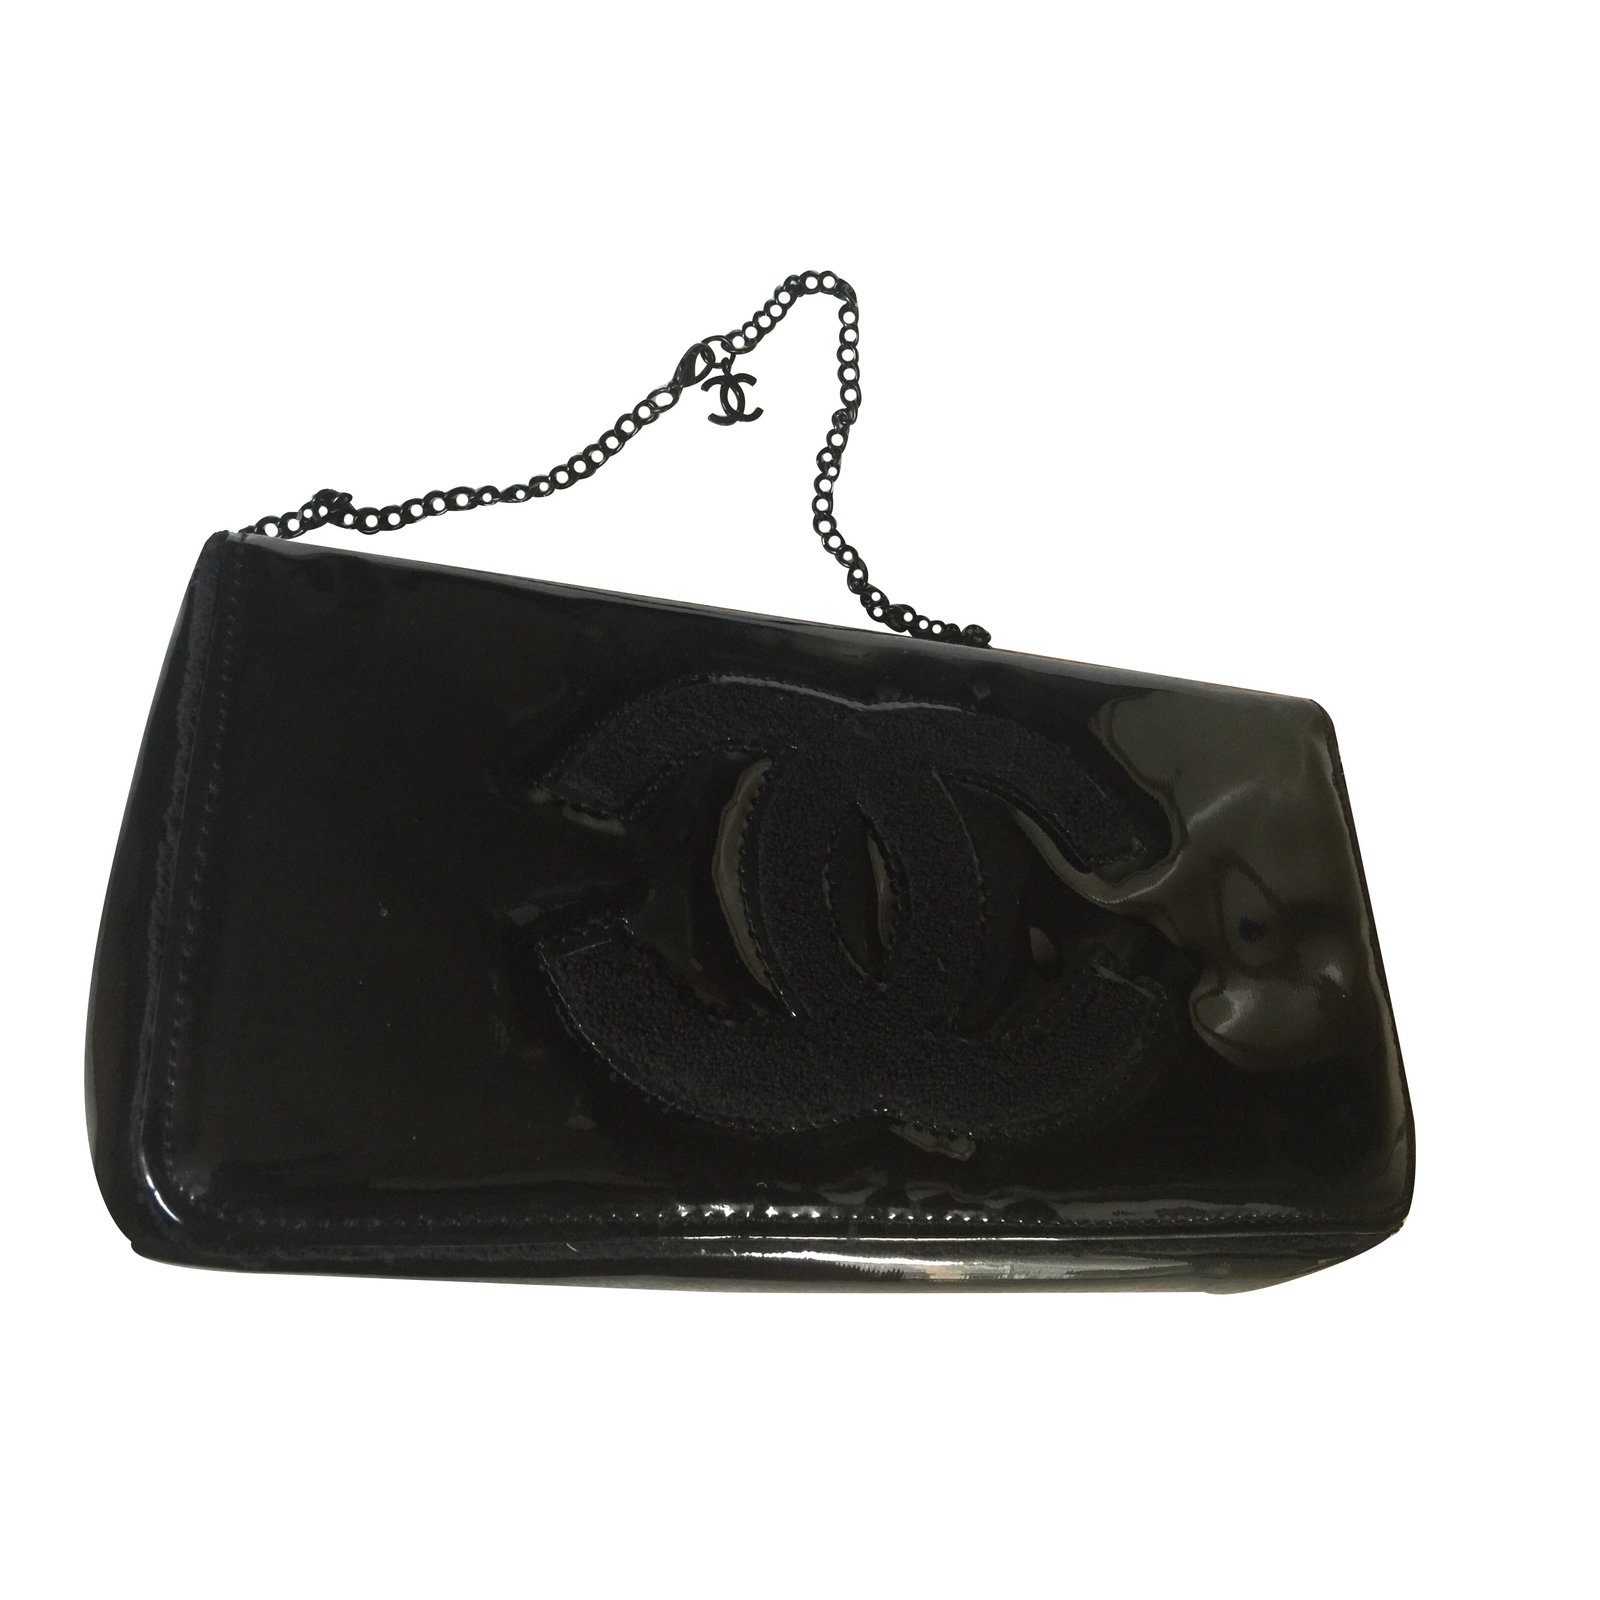 aa72e54e990e Chanel Clutch Bag Vip Gifts Other Black Ref 24364 Joli Closet